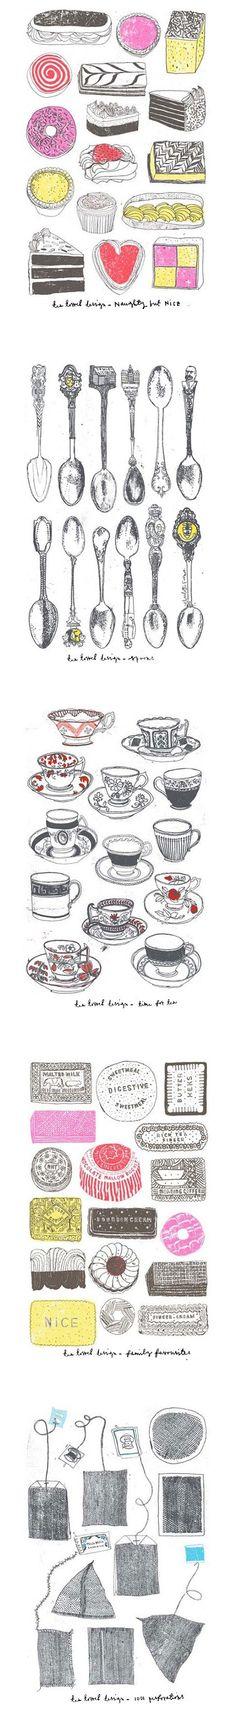 Tea towel designs by Charlotte Farmer